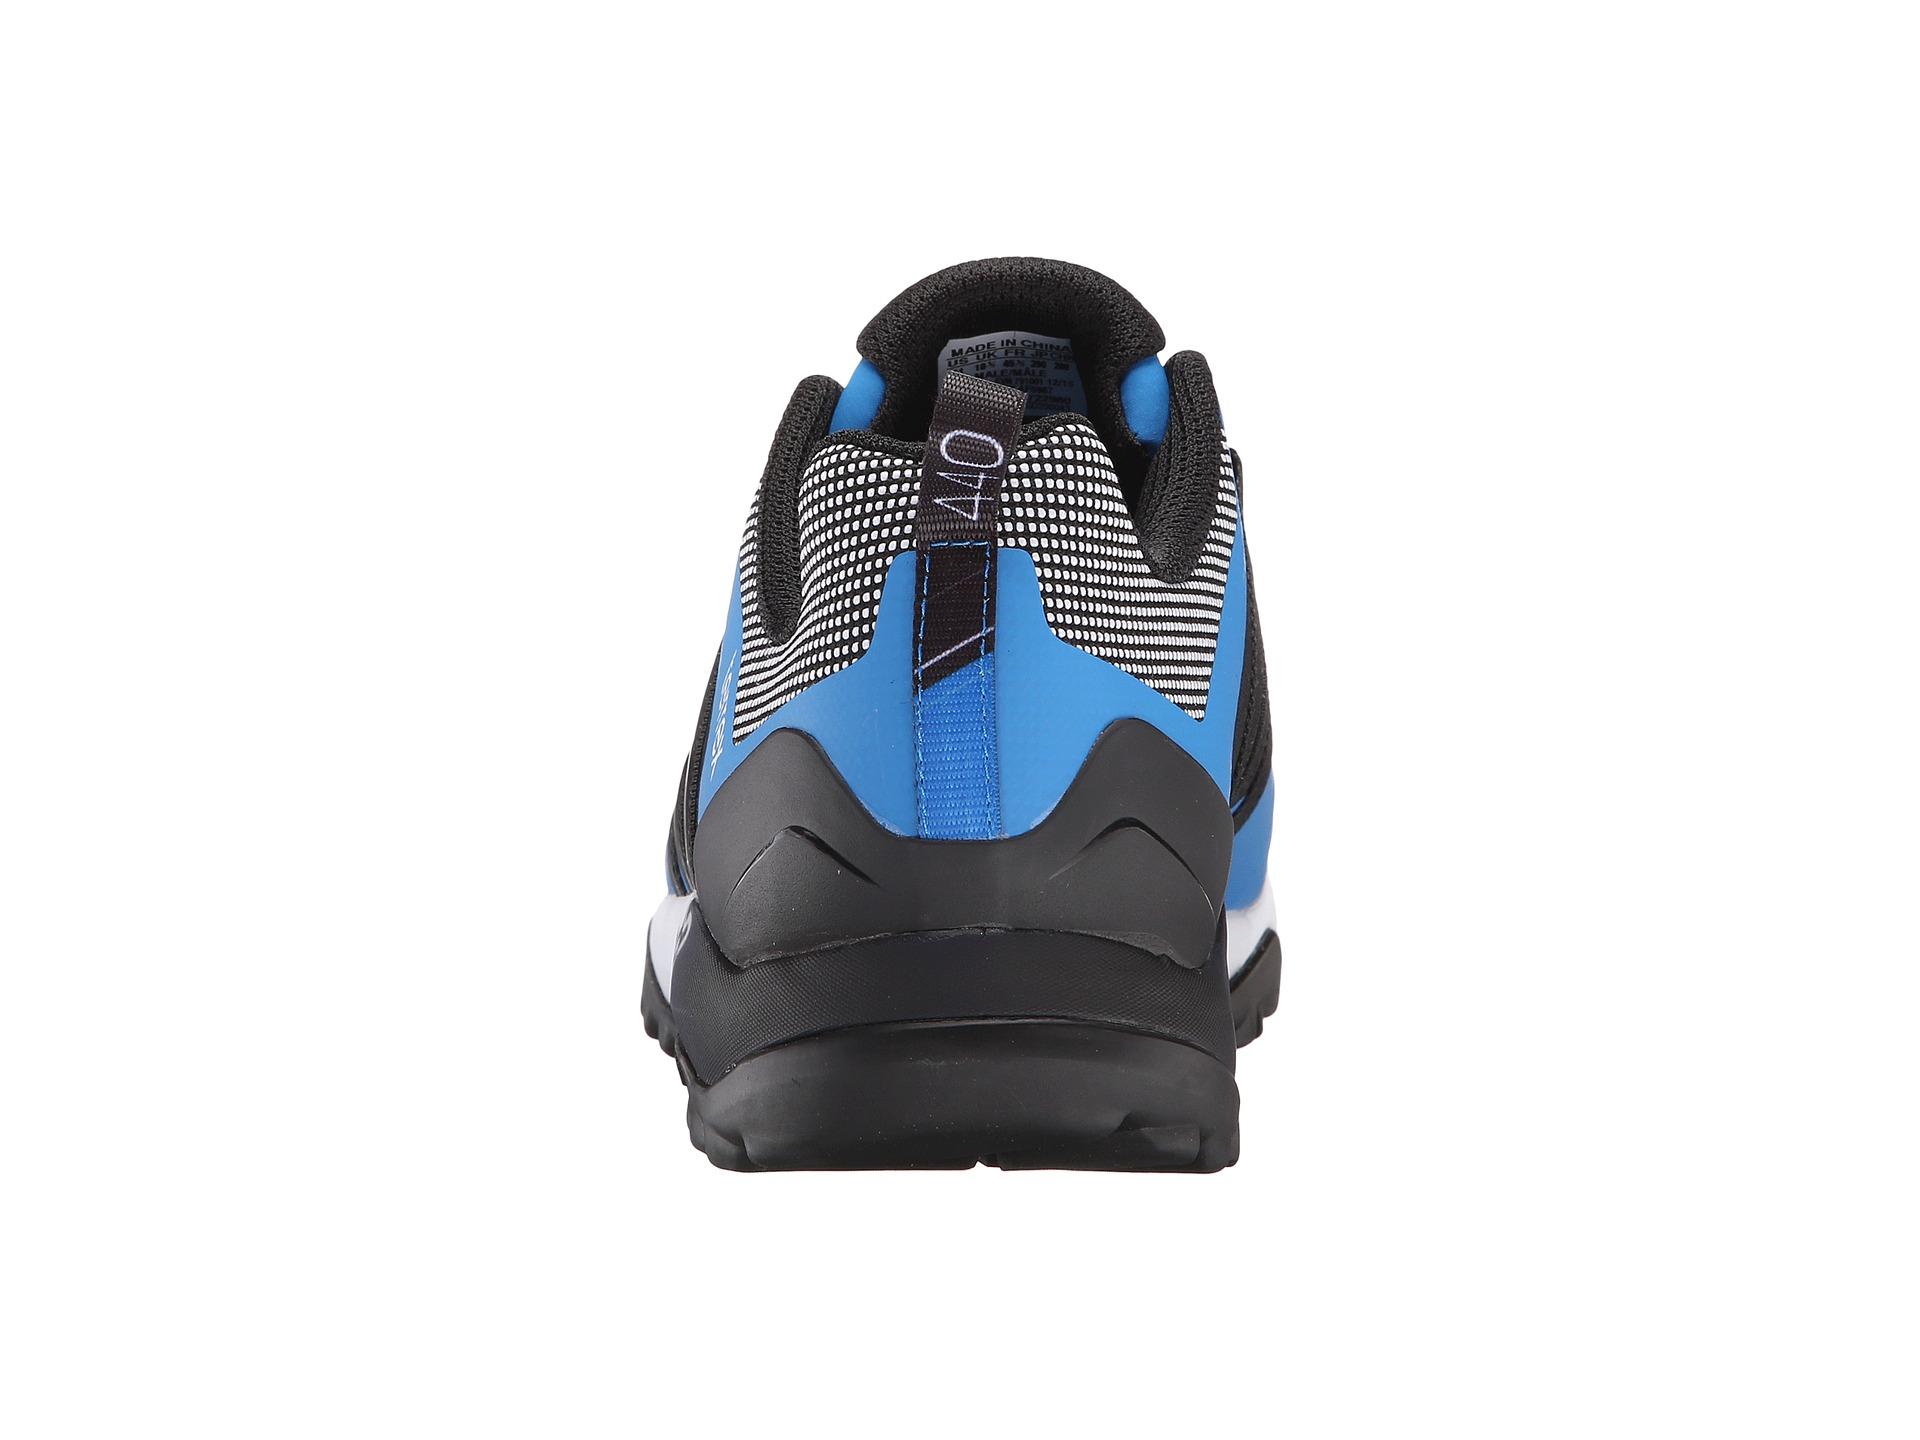 ba085ee005c1 Lyst - adidas Originals Terrex Trail Cross Sl in Black for Men